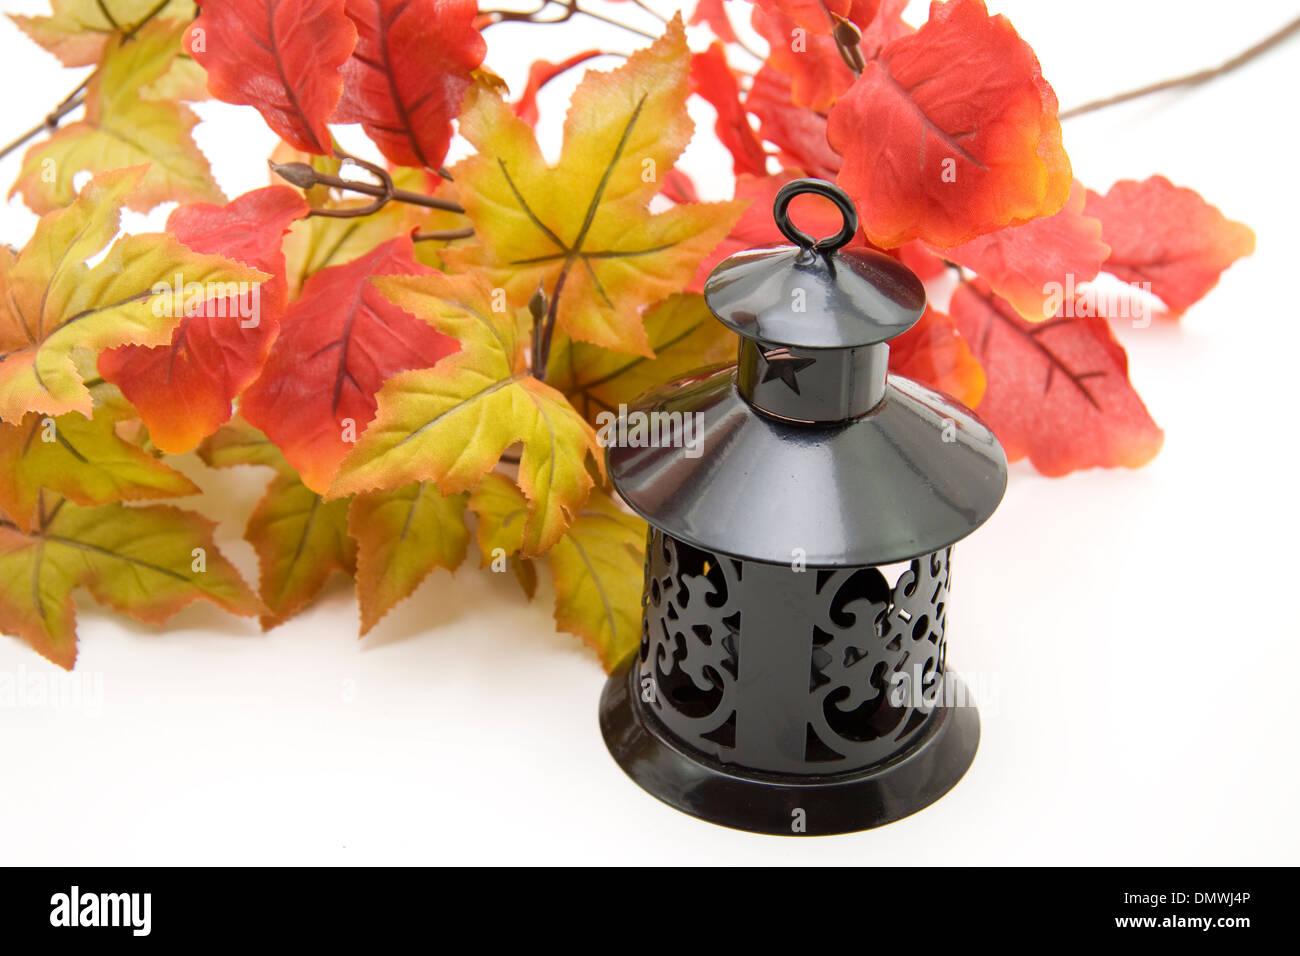 Tea light lantern with sheet branch on white background - Stock Image